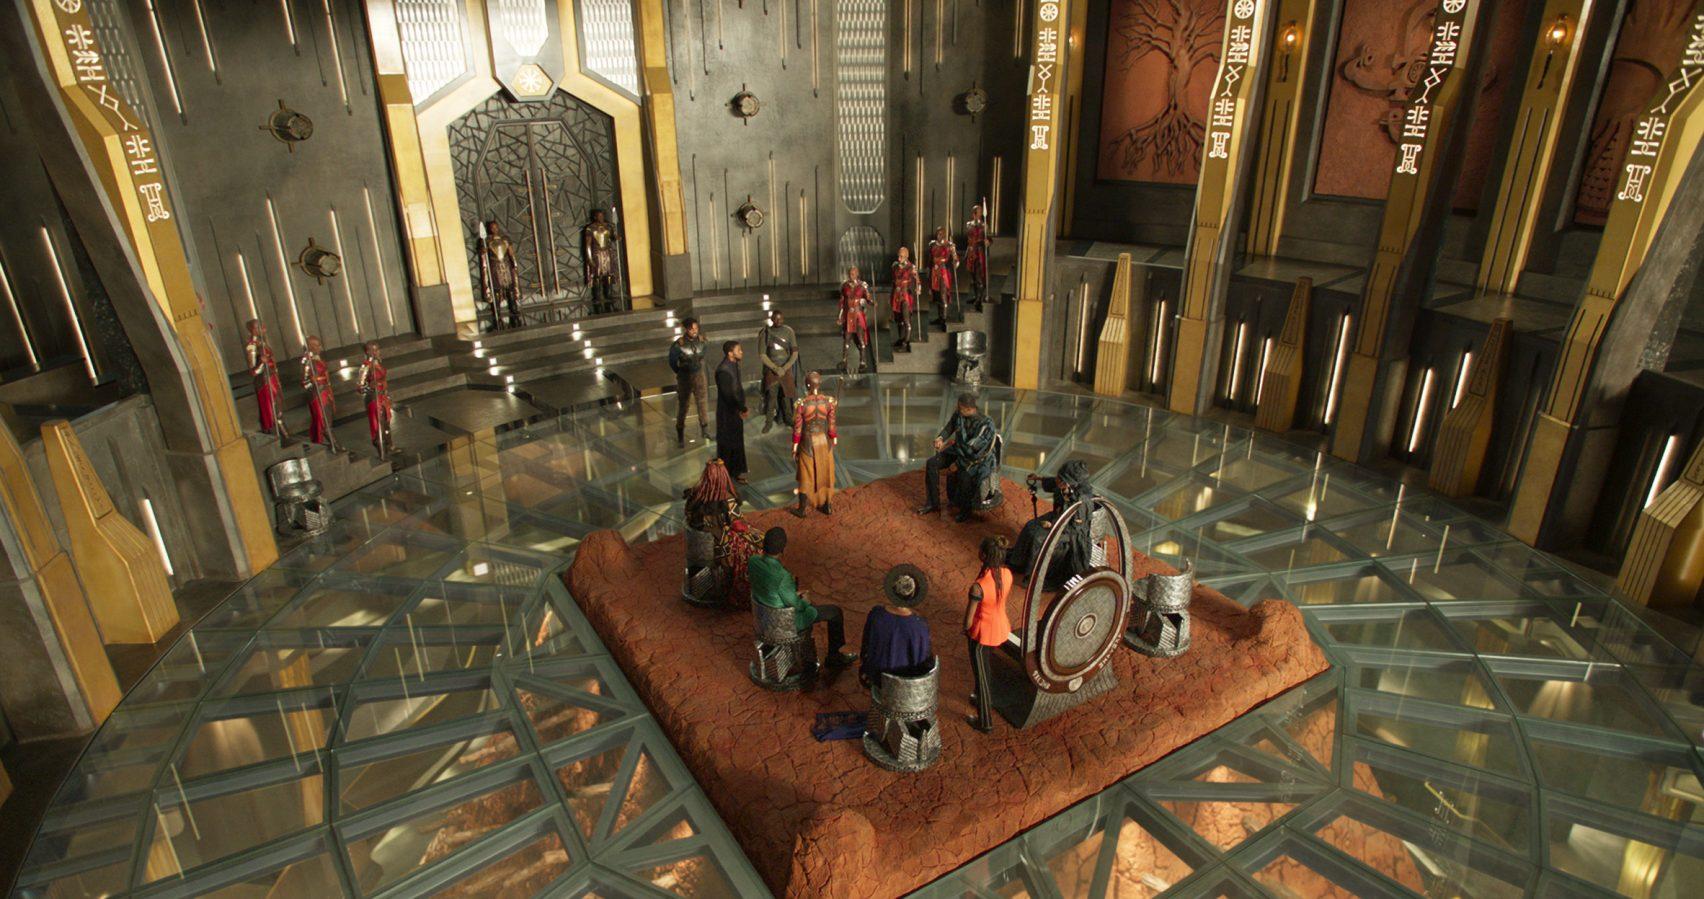 Il palazzo di Wakanda, ispirato a Buckingham Palace / Dezeen